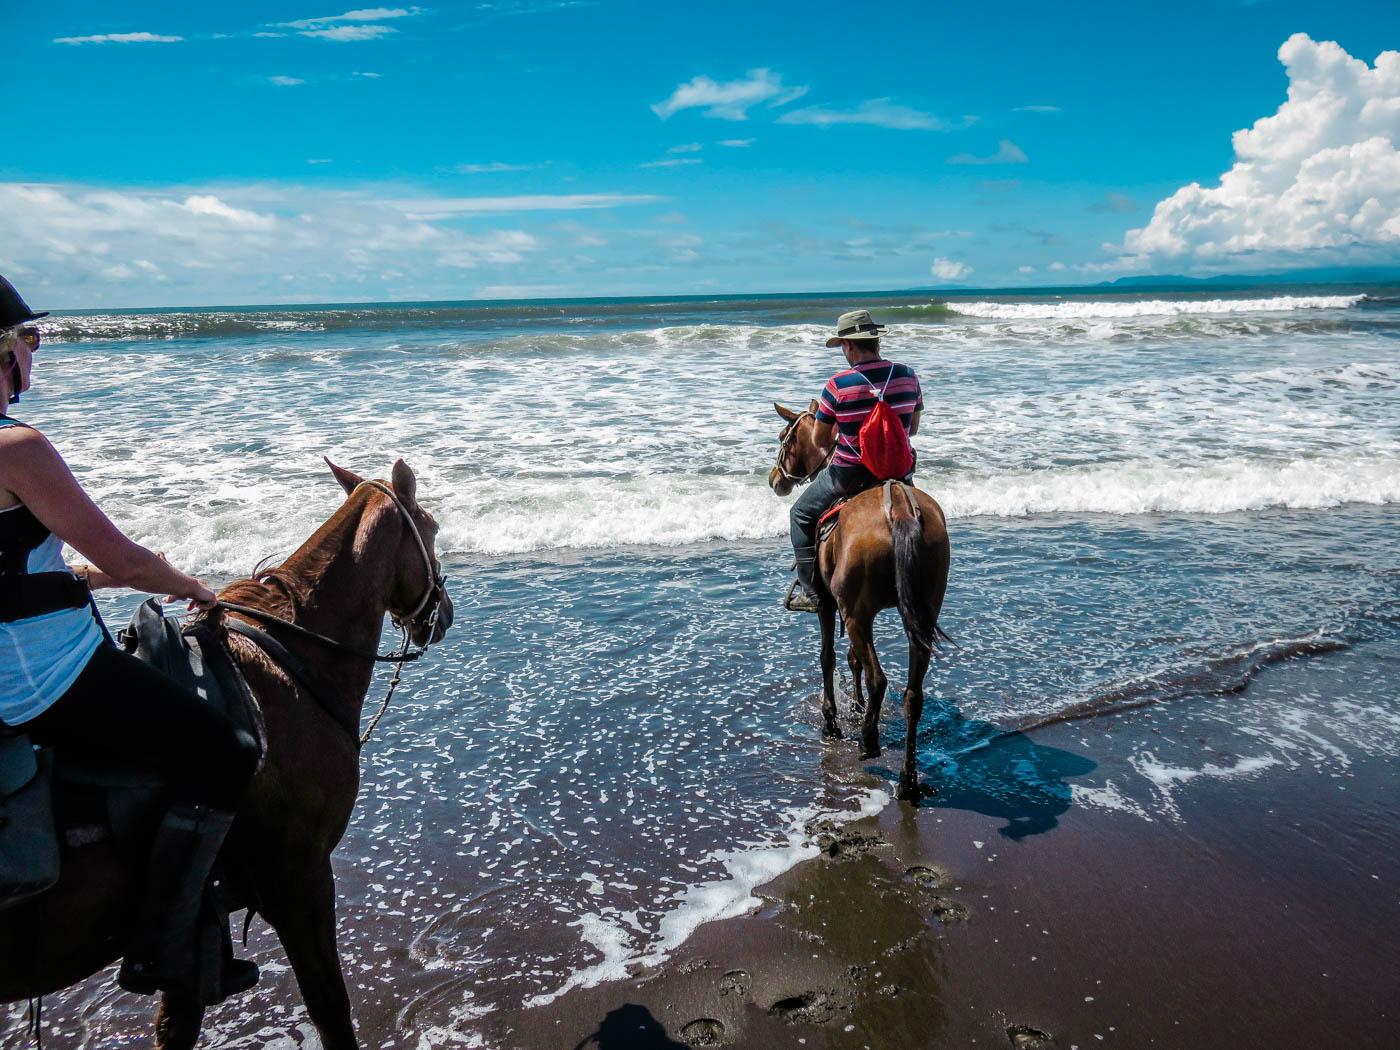 Costa Rica Travel - Horse Riding Adventure I Rainforest I Beach I The Discoveries Of Travel Blog #traveltips #holidaydestinations-1.jpg